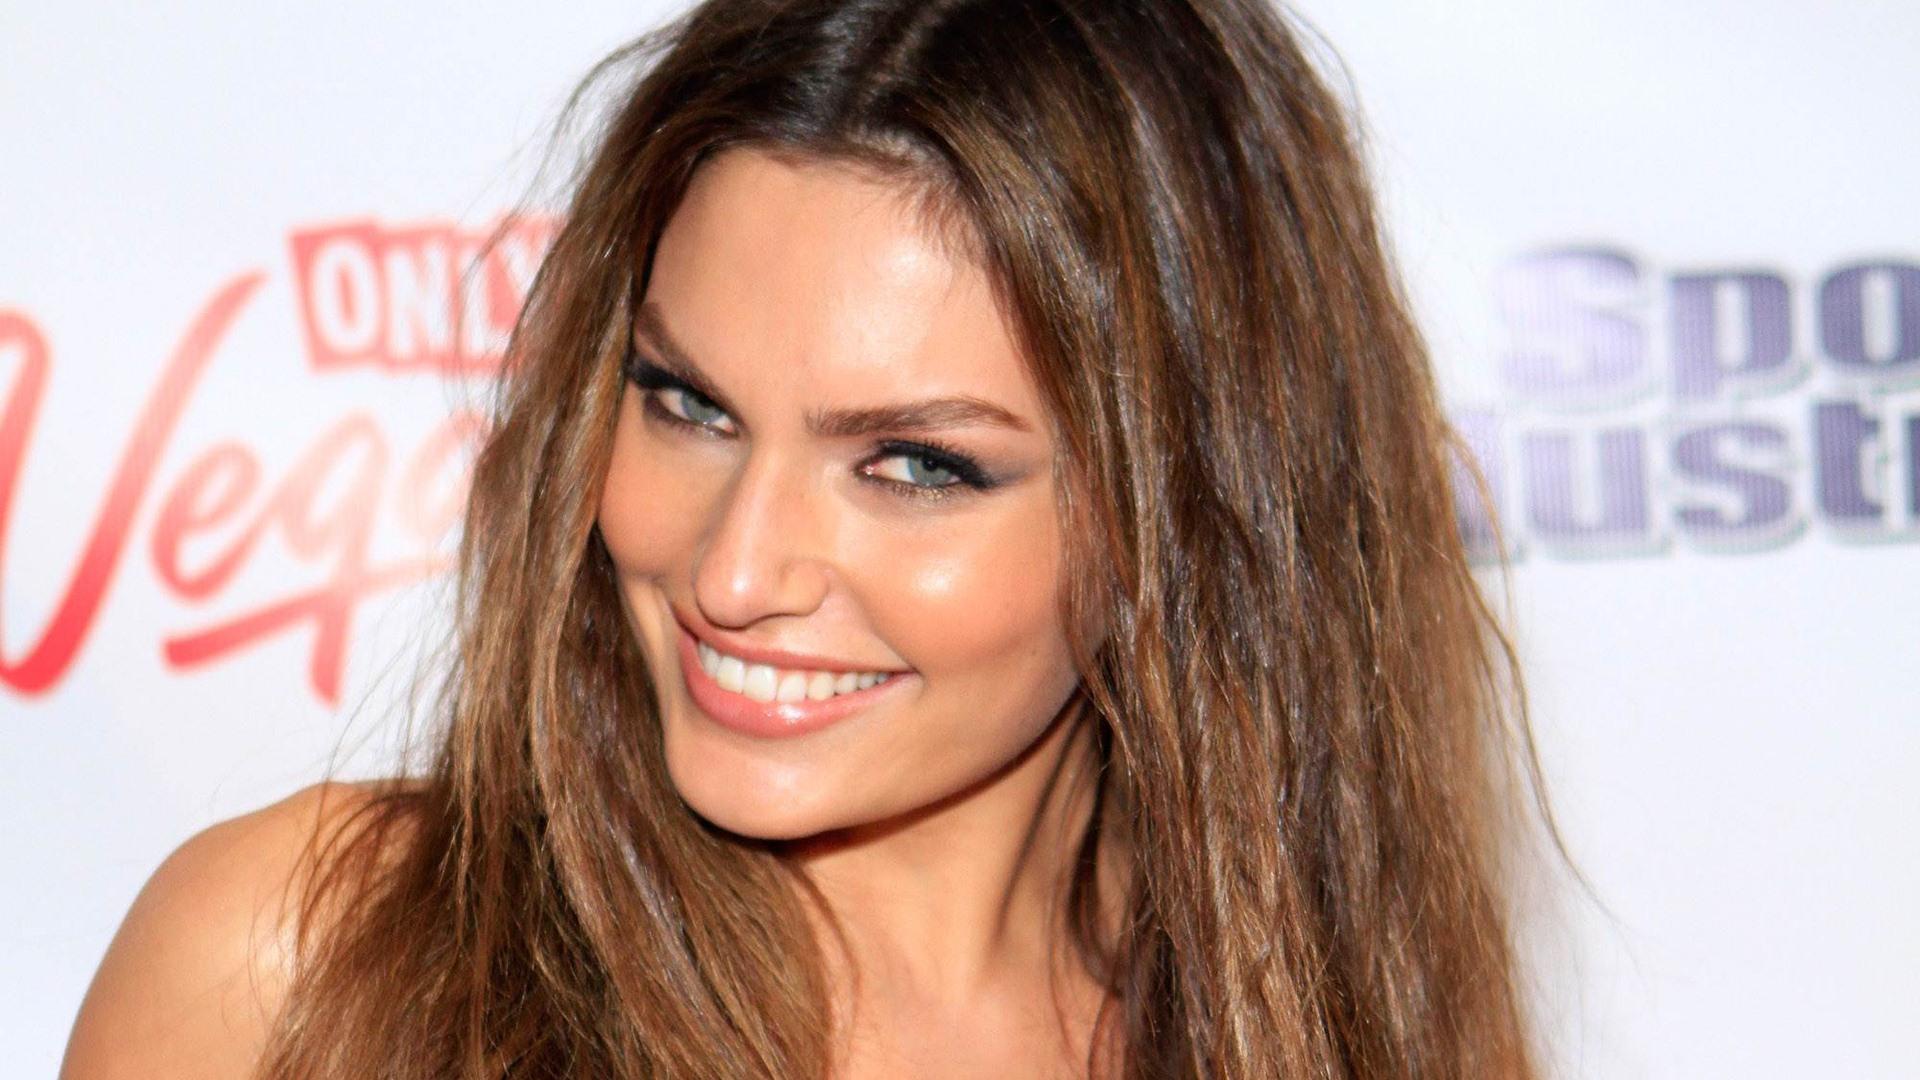 alyssa miller smile wallpaper 60466